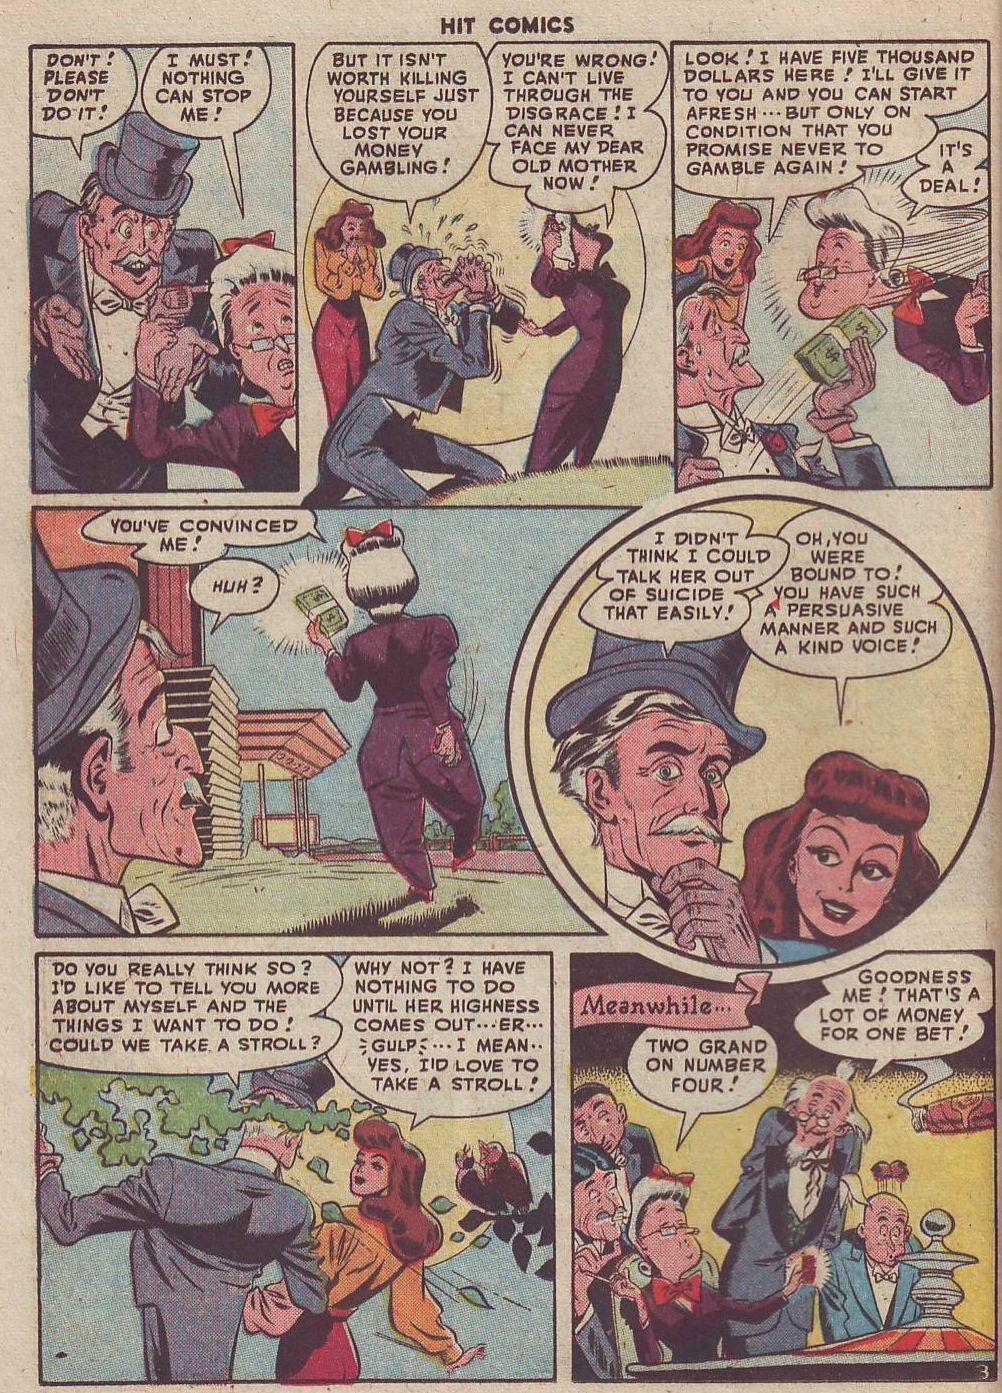 Read online Hit Comics comic -  Issue #51 - 34